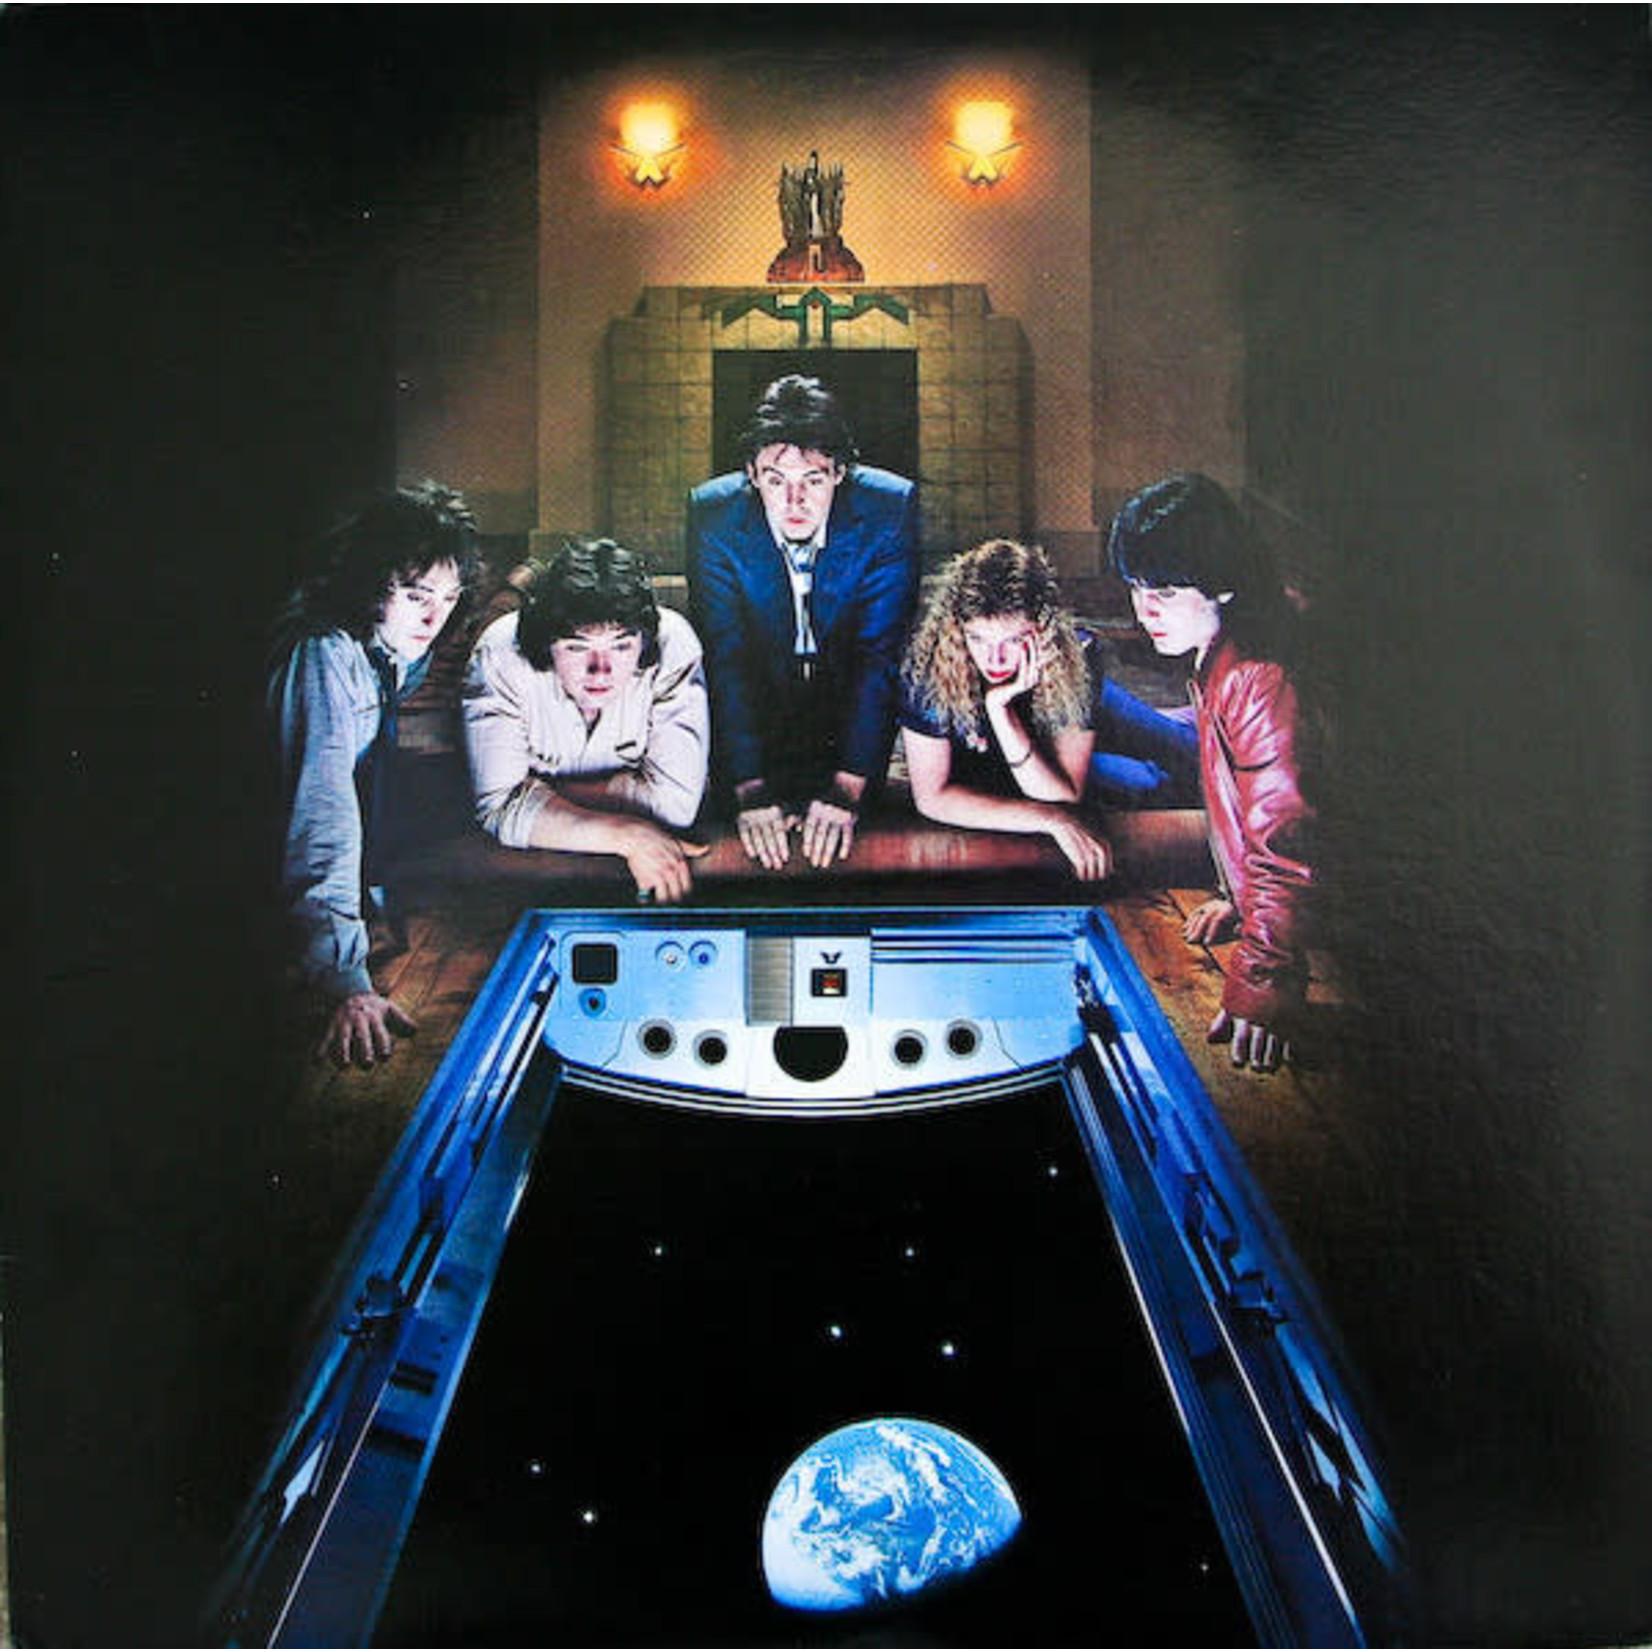 [Vintage] McCartney, Paul & Wings (Beatles): Back to the Egg